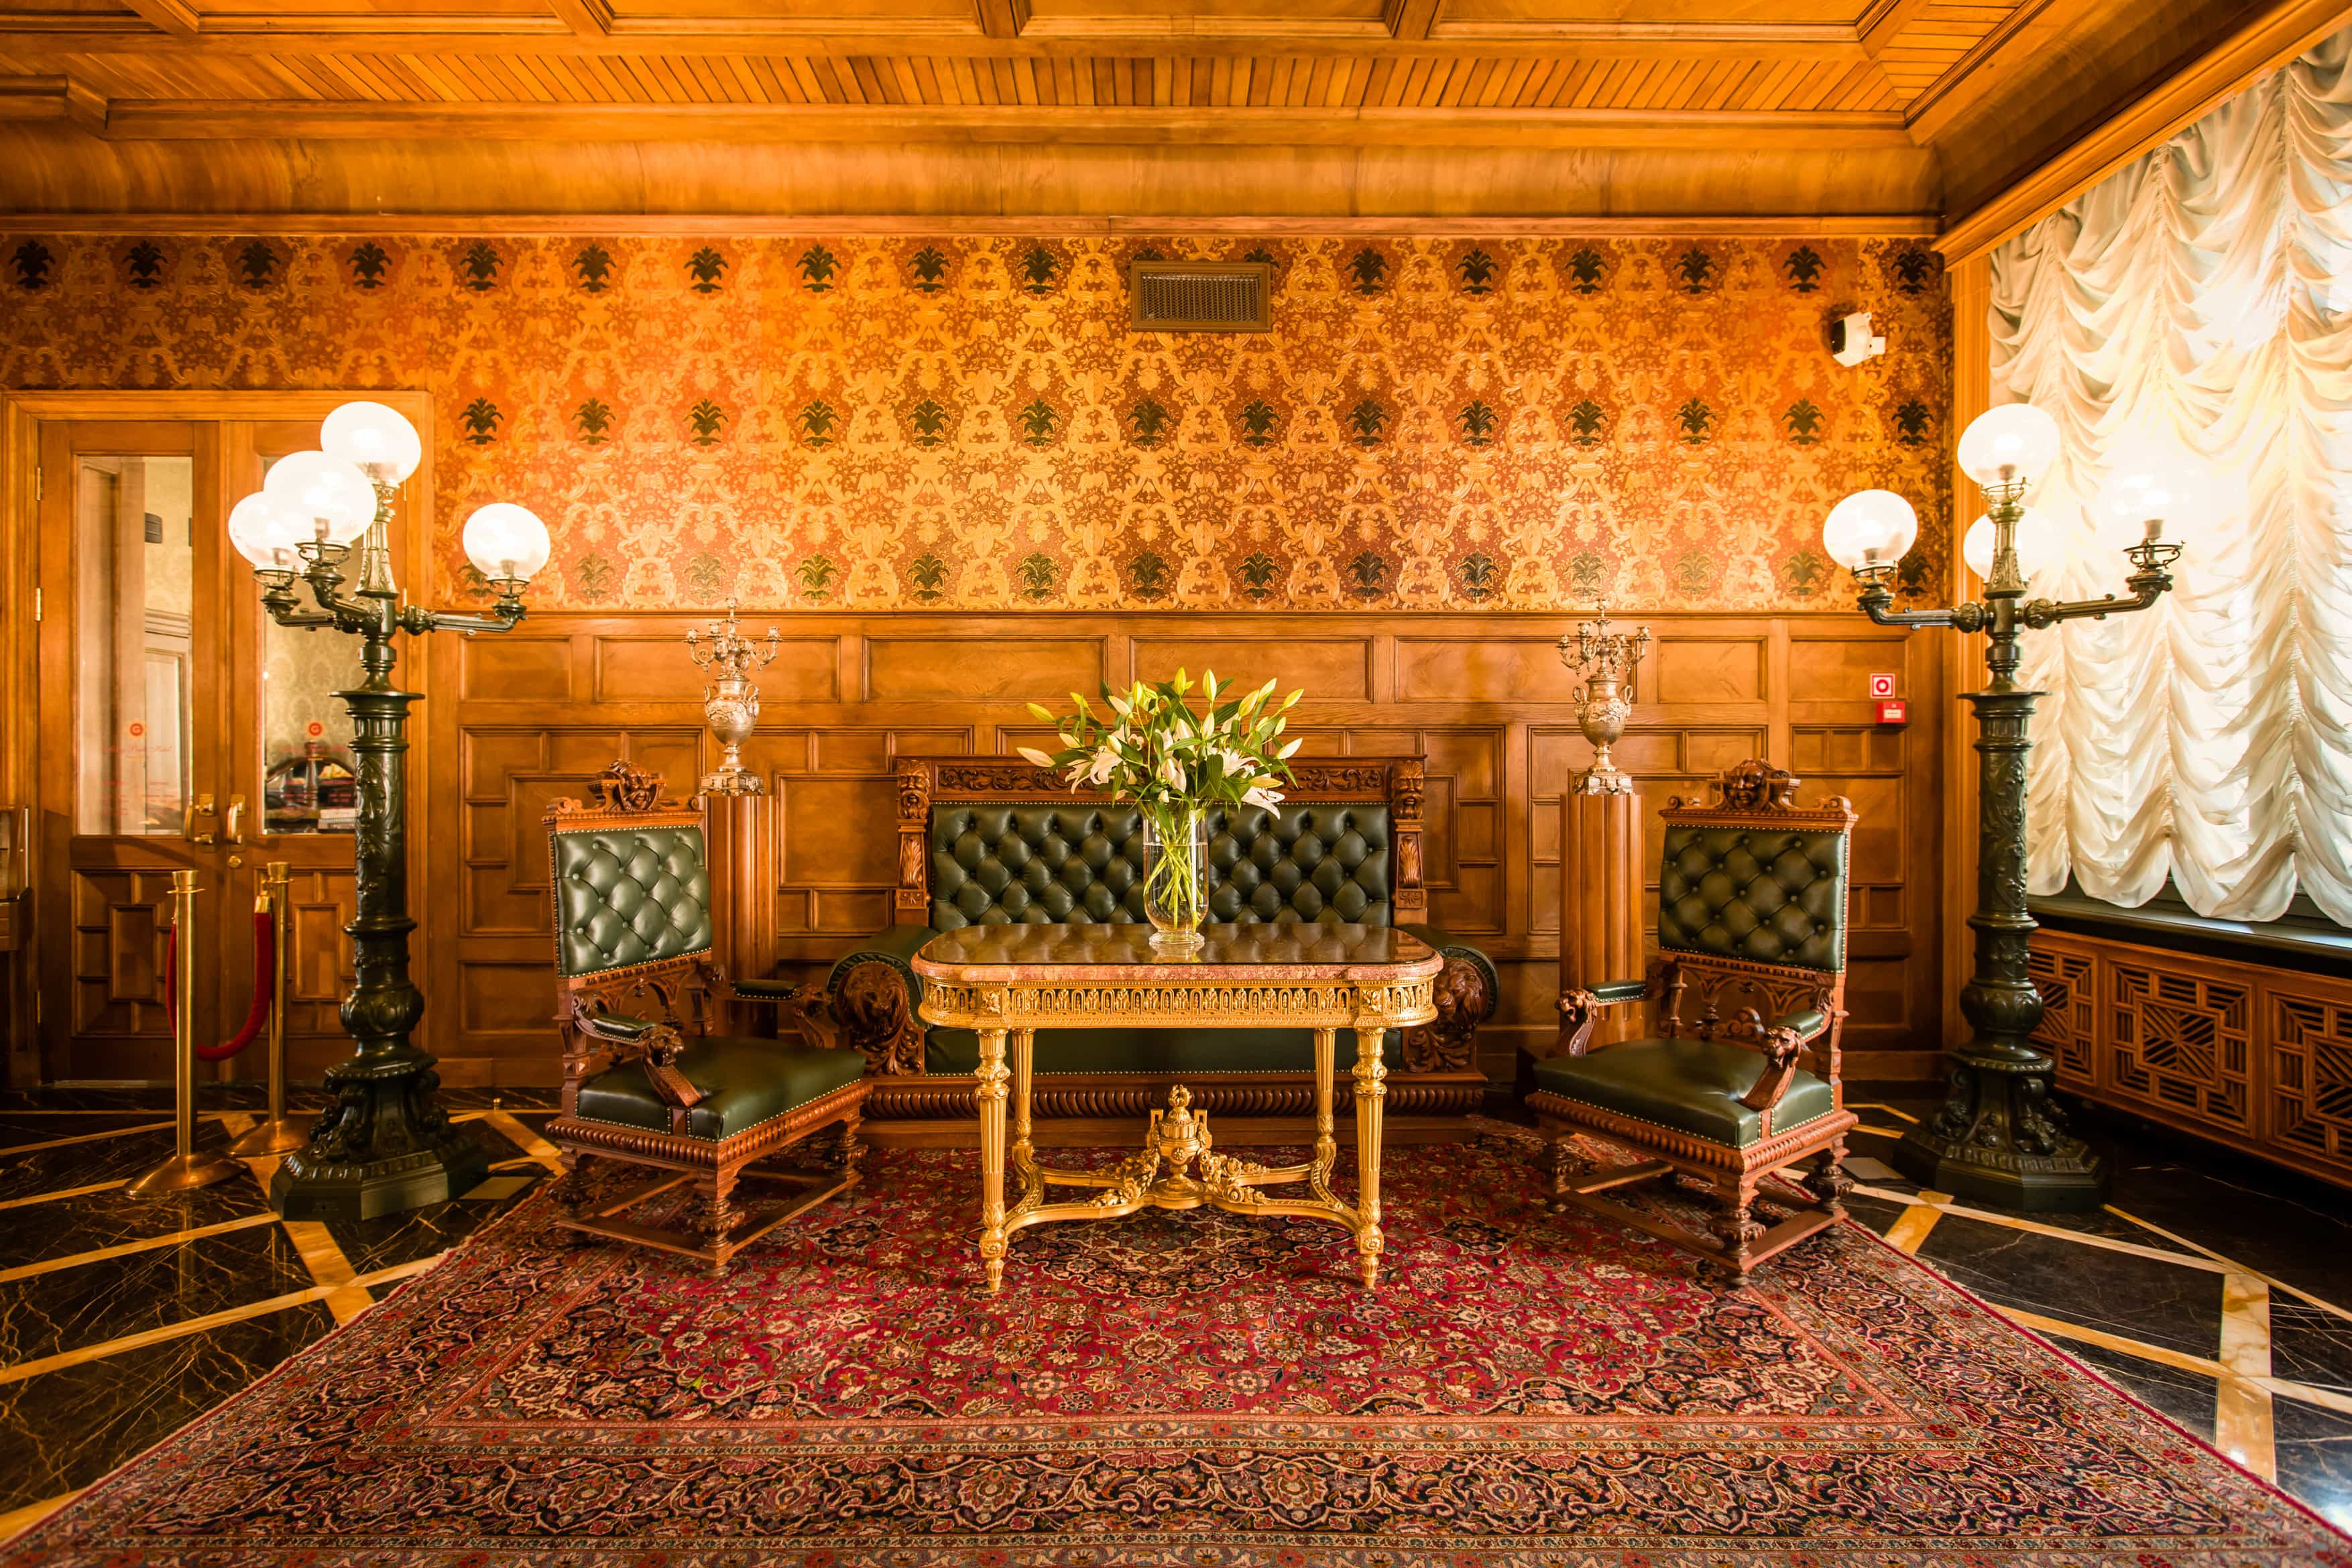 Gallery Park Hotel & Spa Hall.